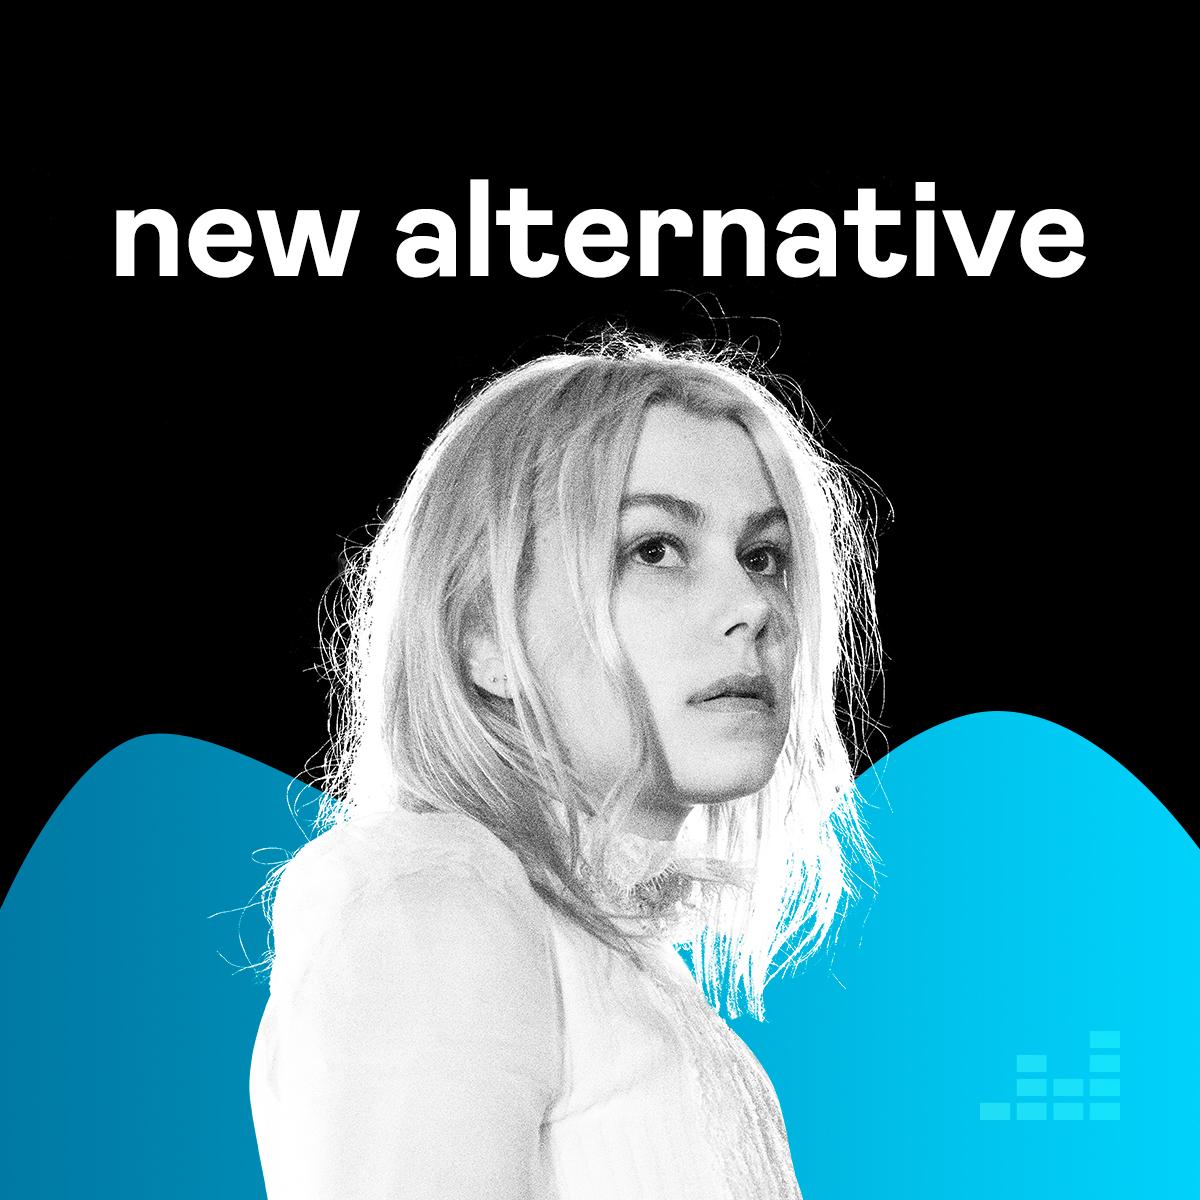 Oh hey! @phoebe_bridgers is on @Deezers New Alternative cover! ✨ Listen to the whole playlist here: dzr.fm/NewAlt